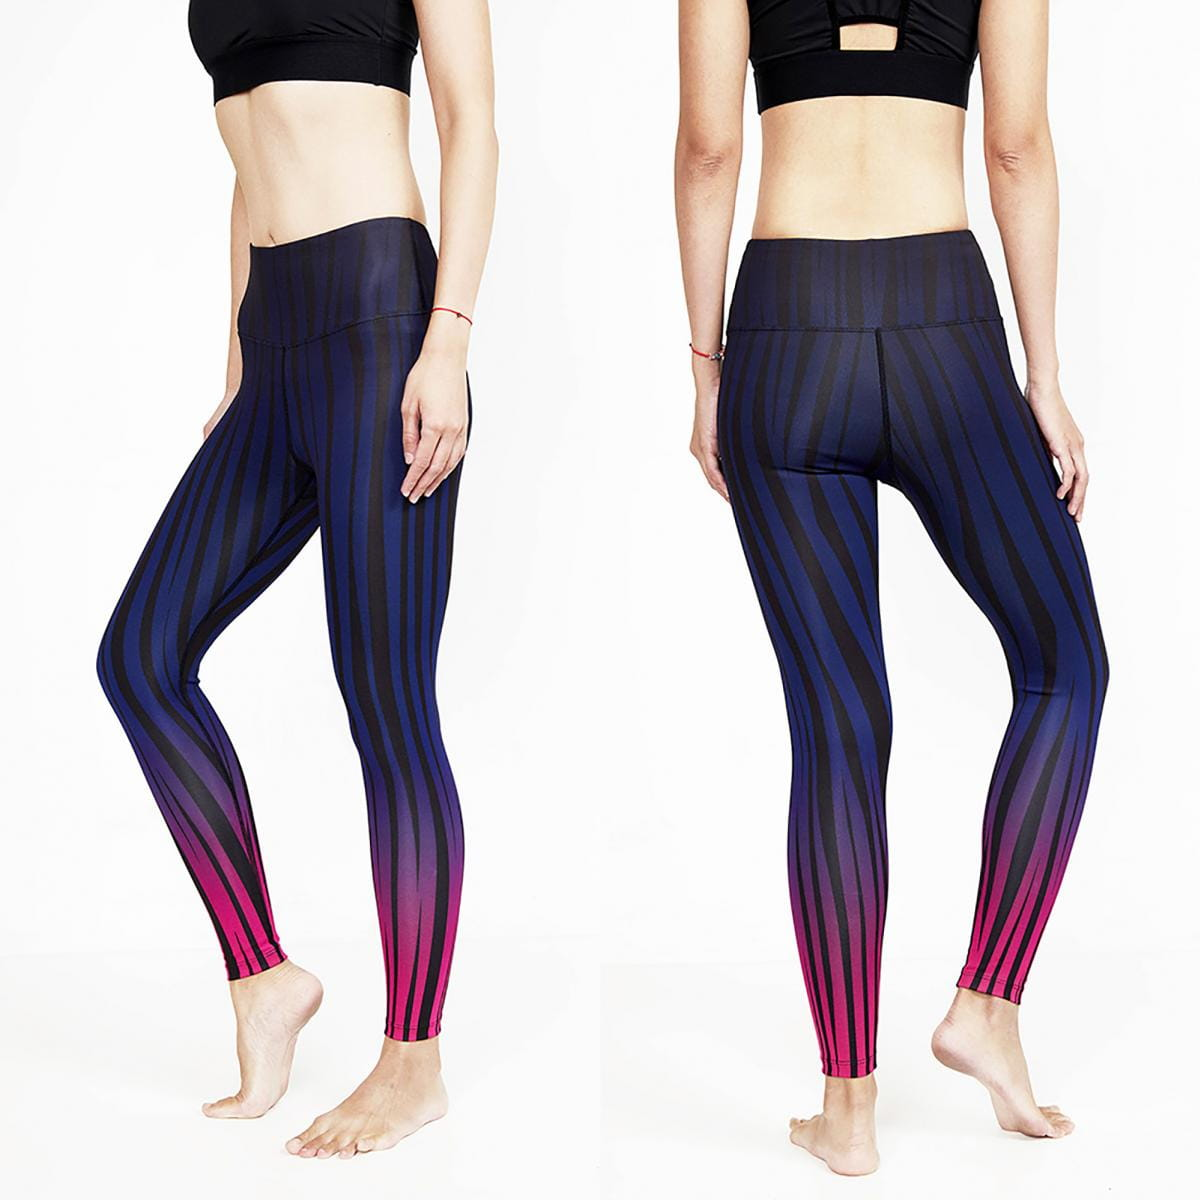 【ELASTI】典莎瑜珈褲(碘紗抗菌除臭機能)-迷幻斑馬 2